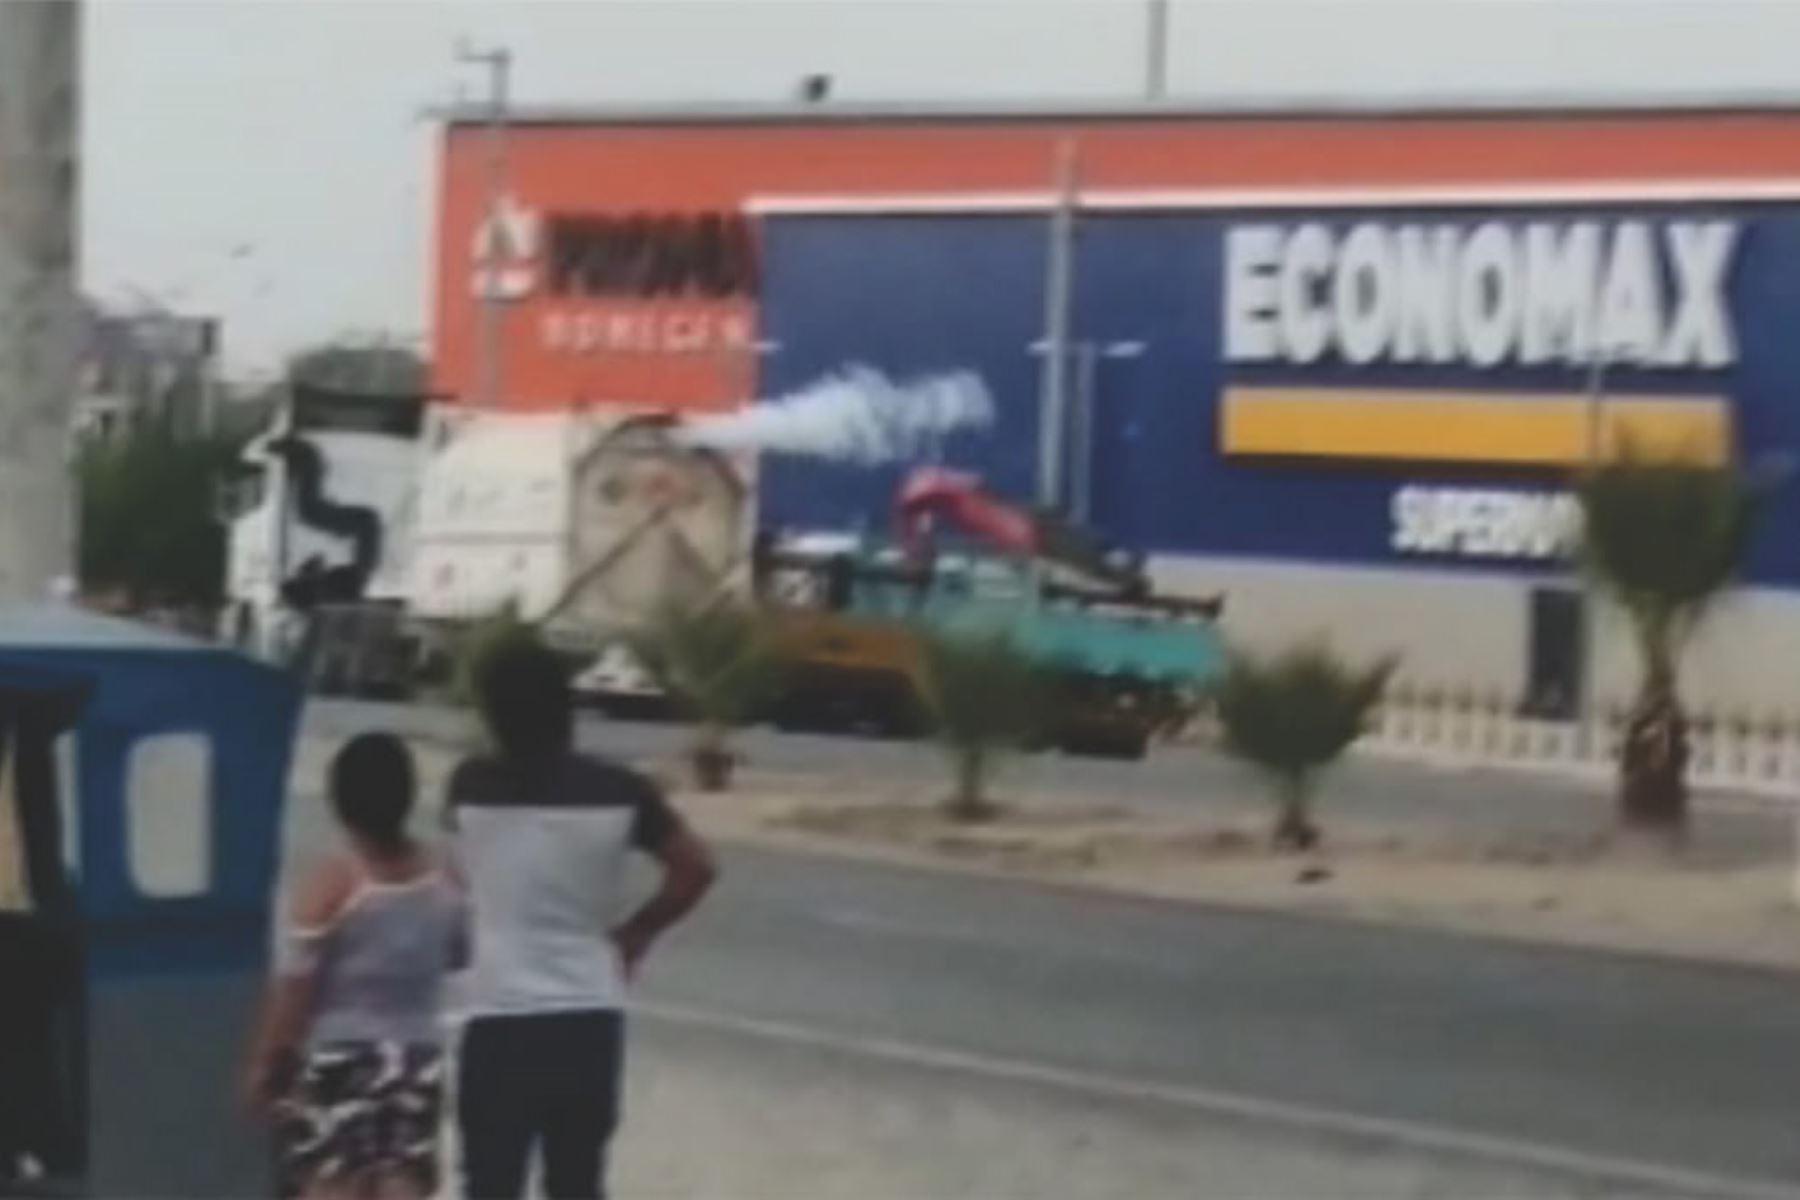 Fuga de gas de cisterna generó alarma en centro comercial de Sullana, en Piura. ANDINA/Difusión